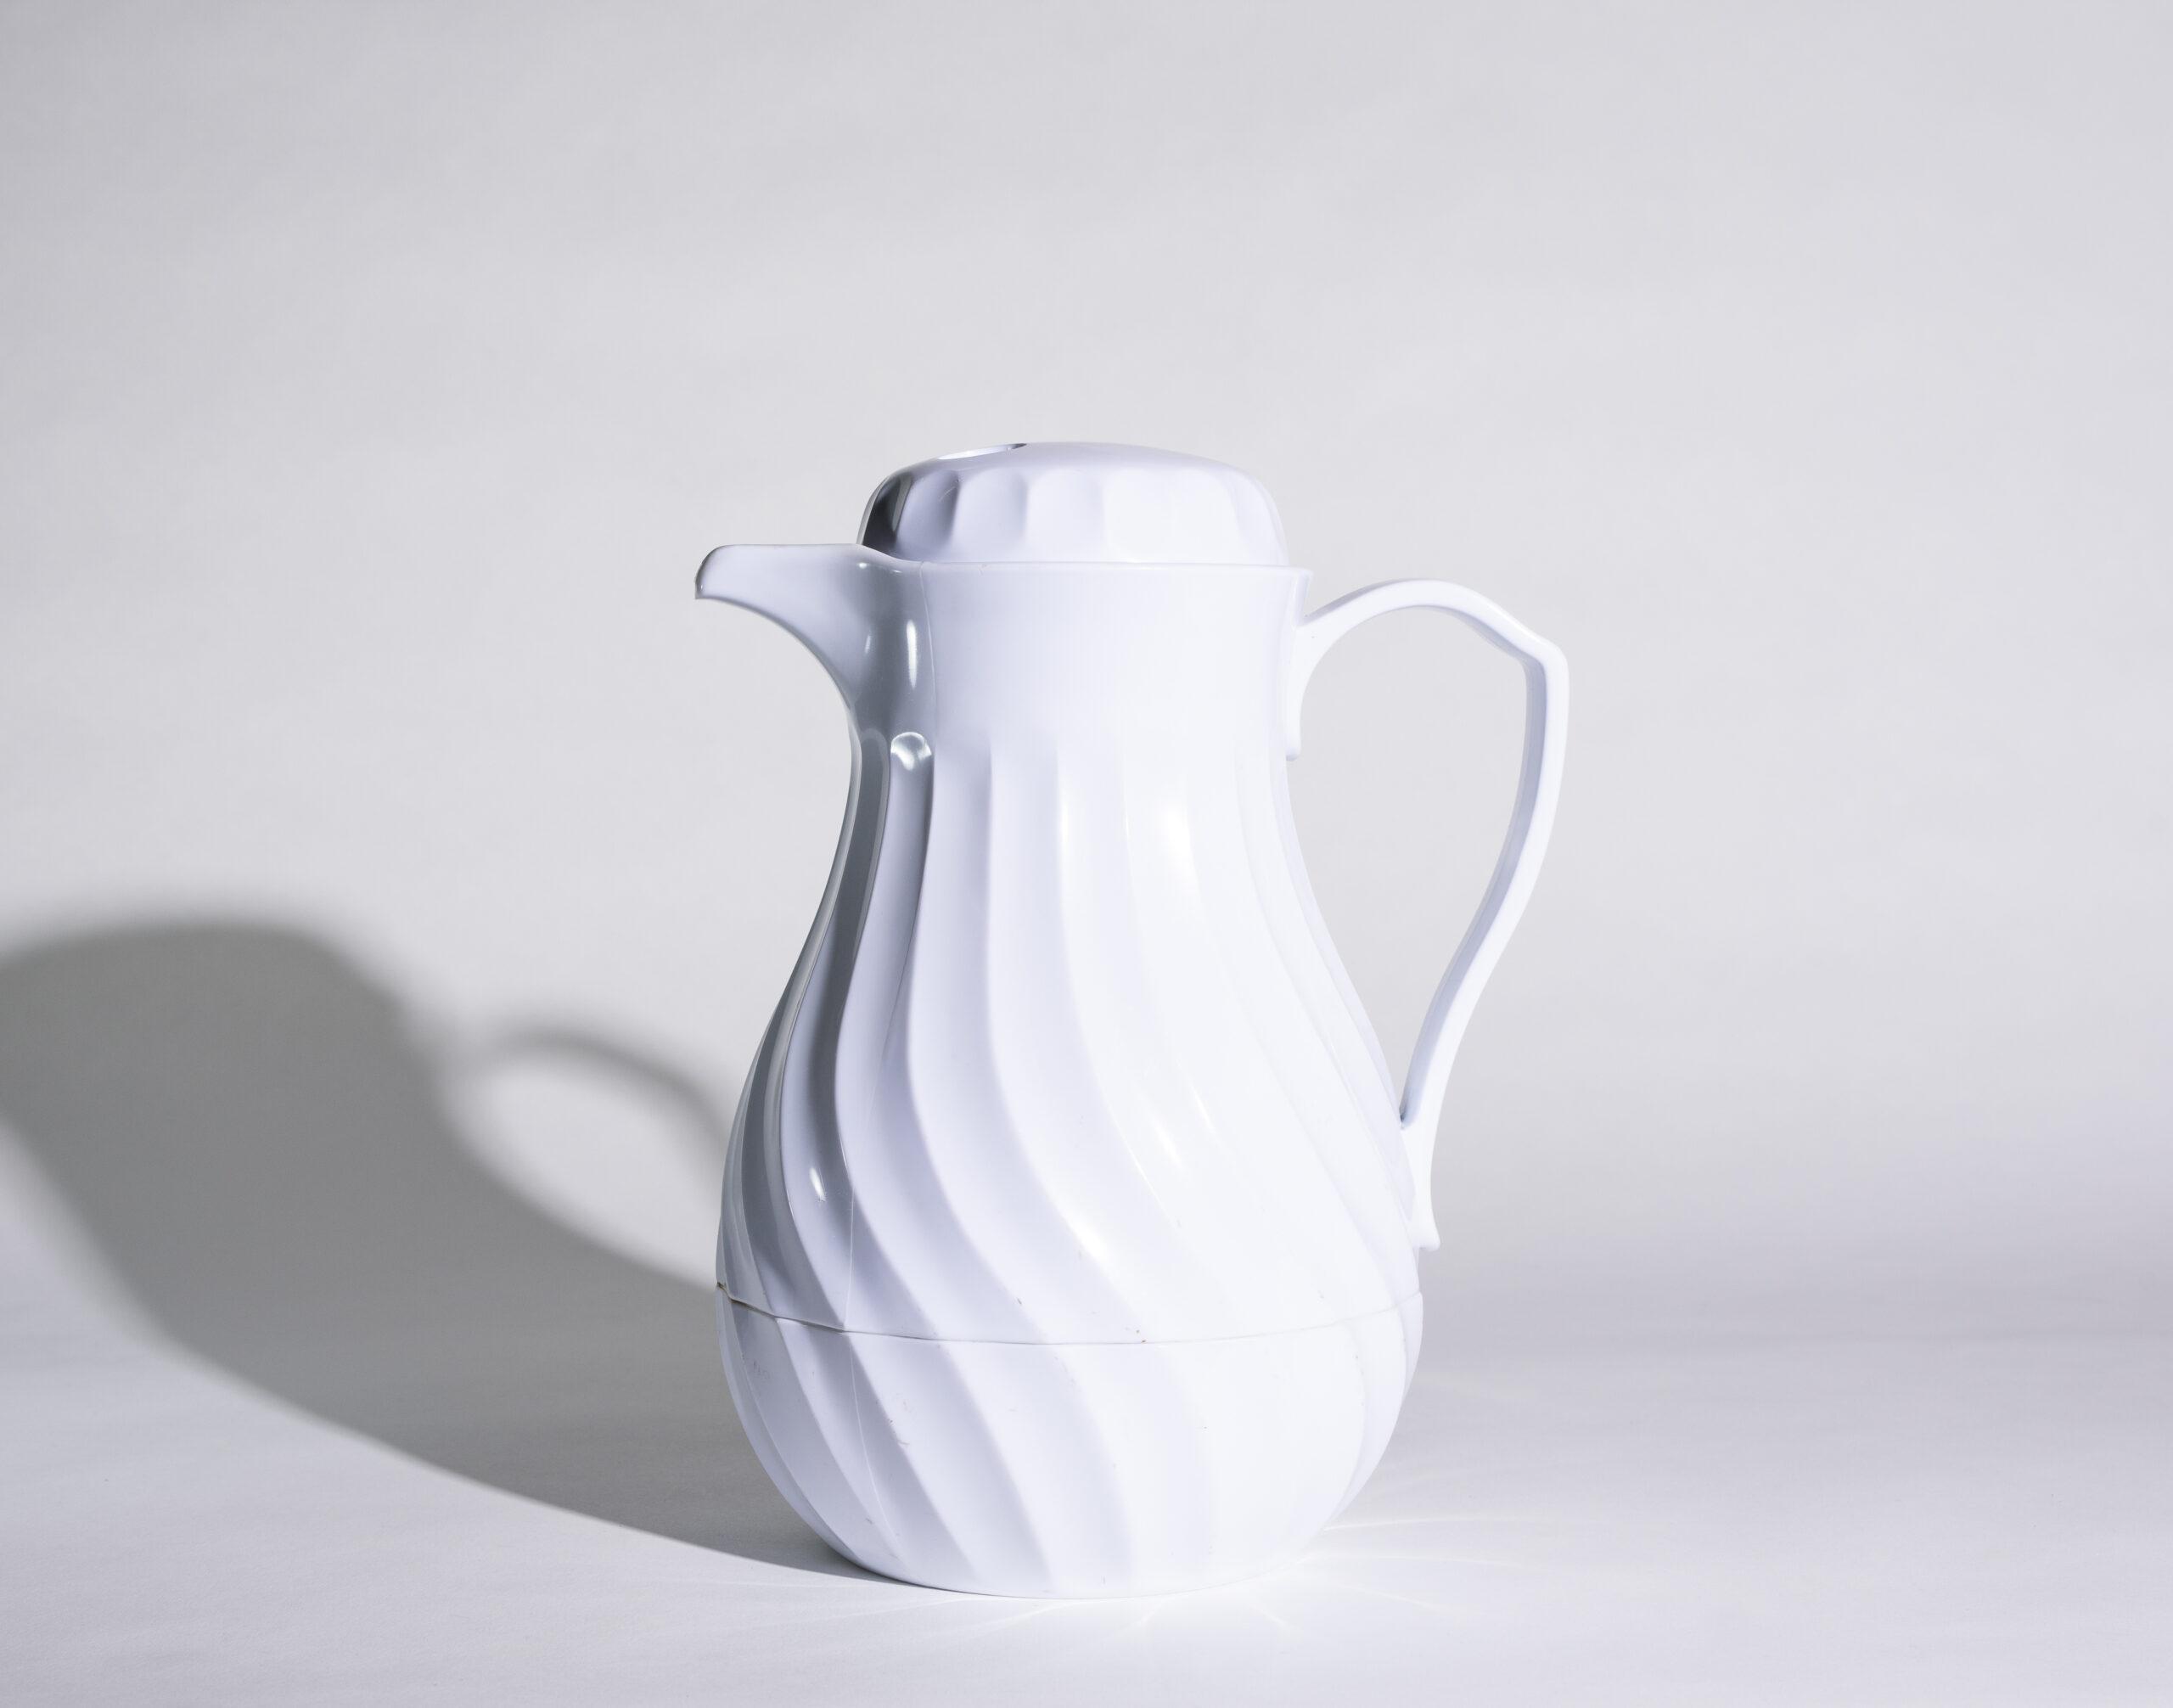 Coffee server (white, plastic)